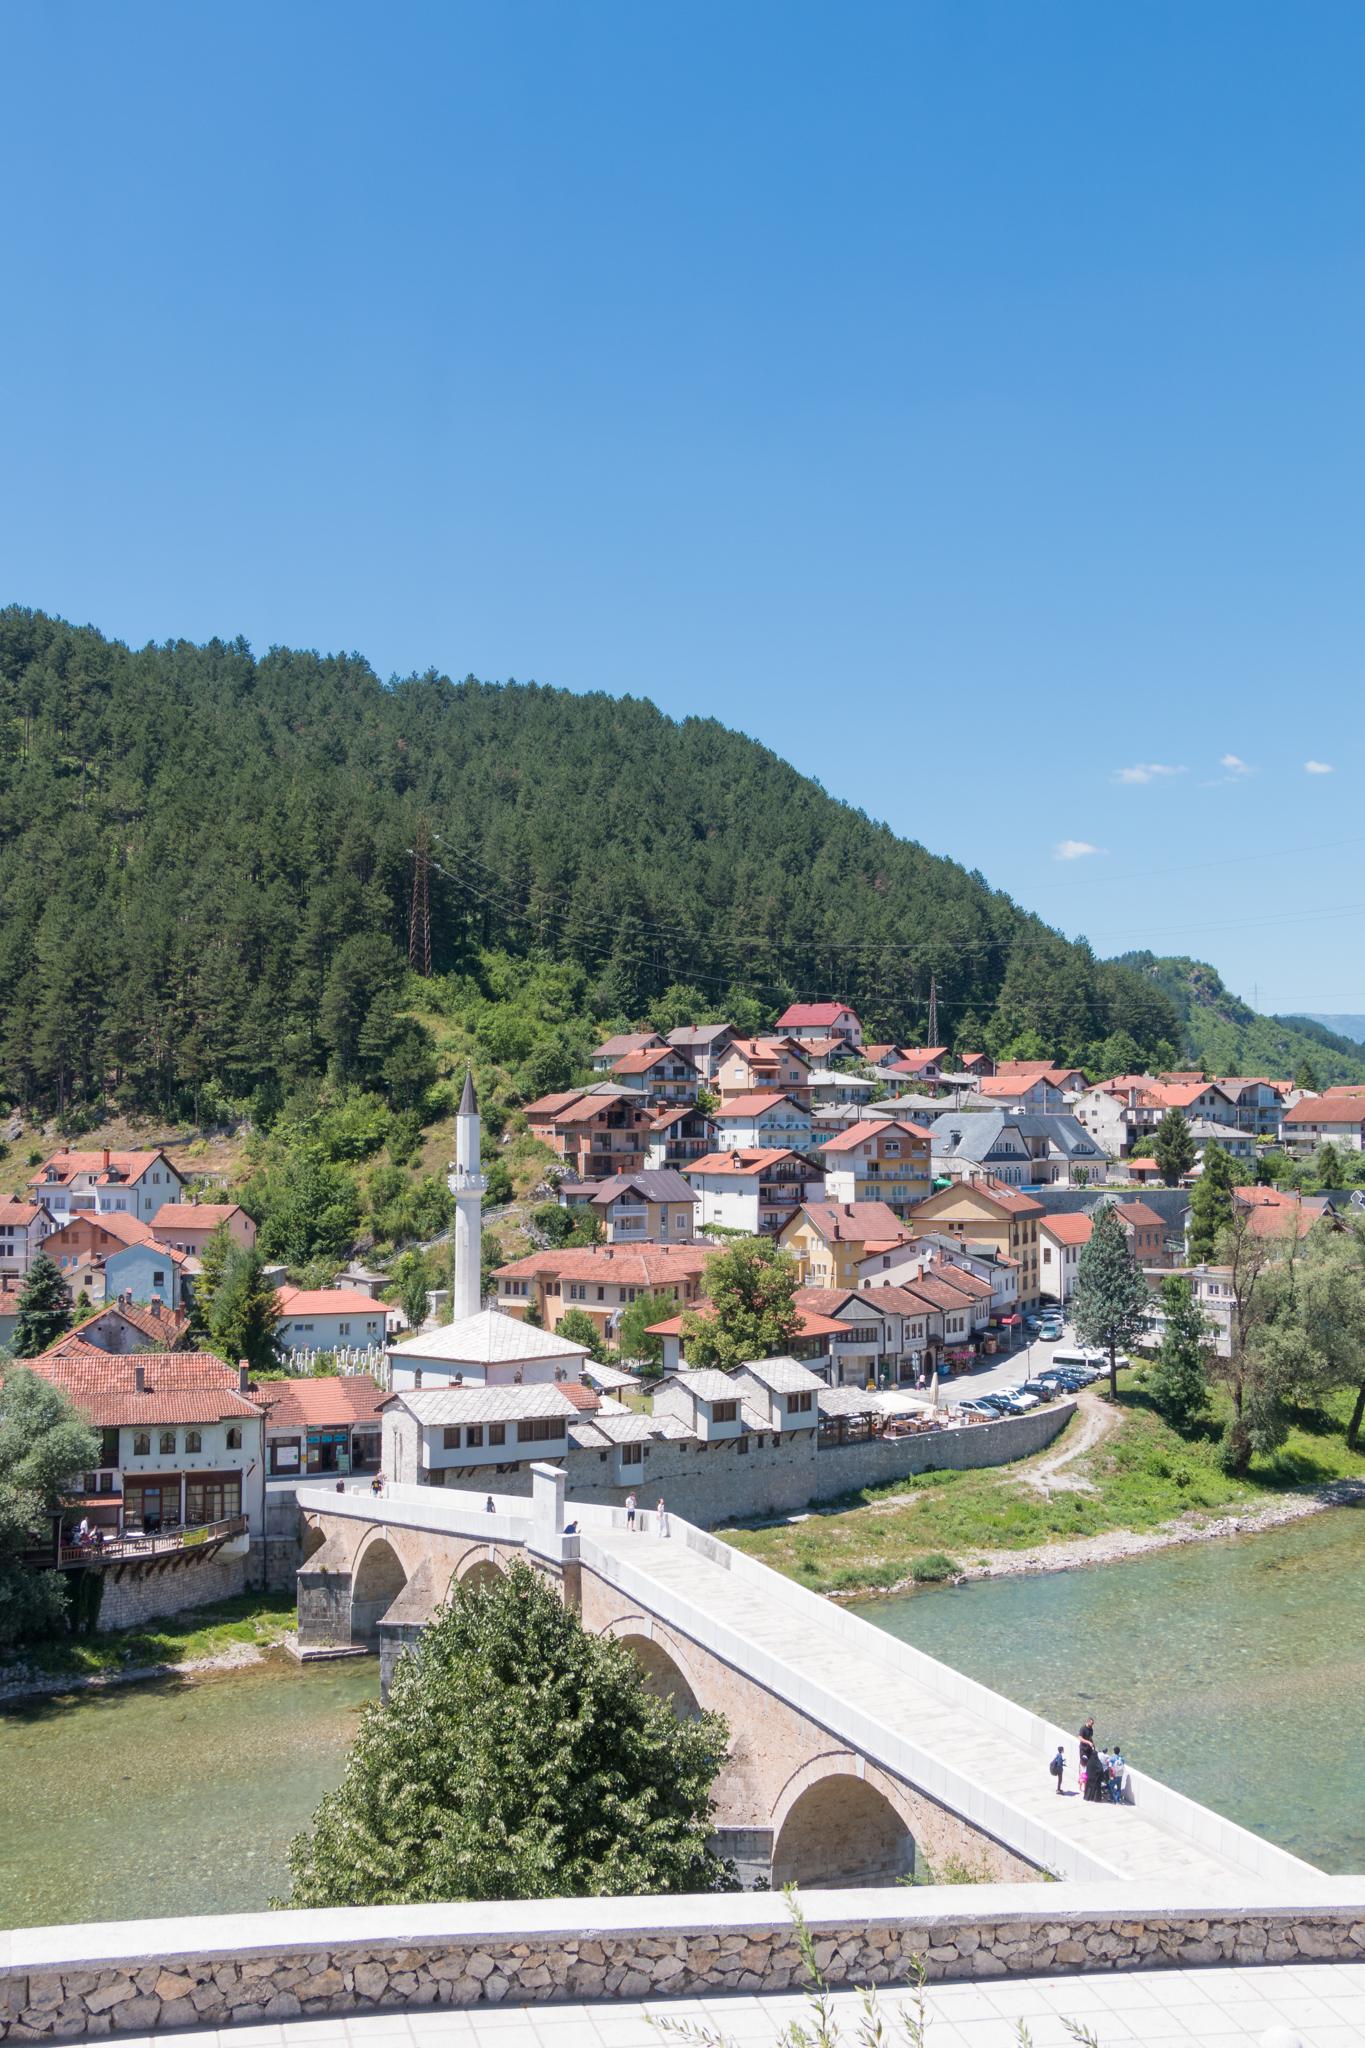 Konjic, Bosnia | Sea of Atlas